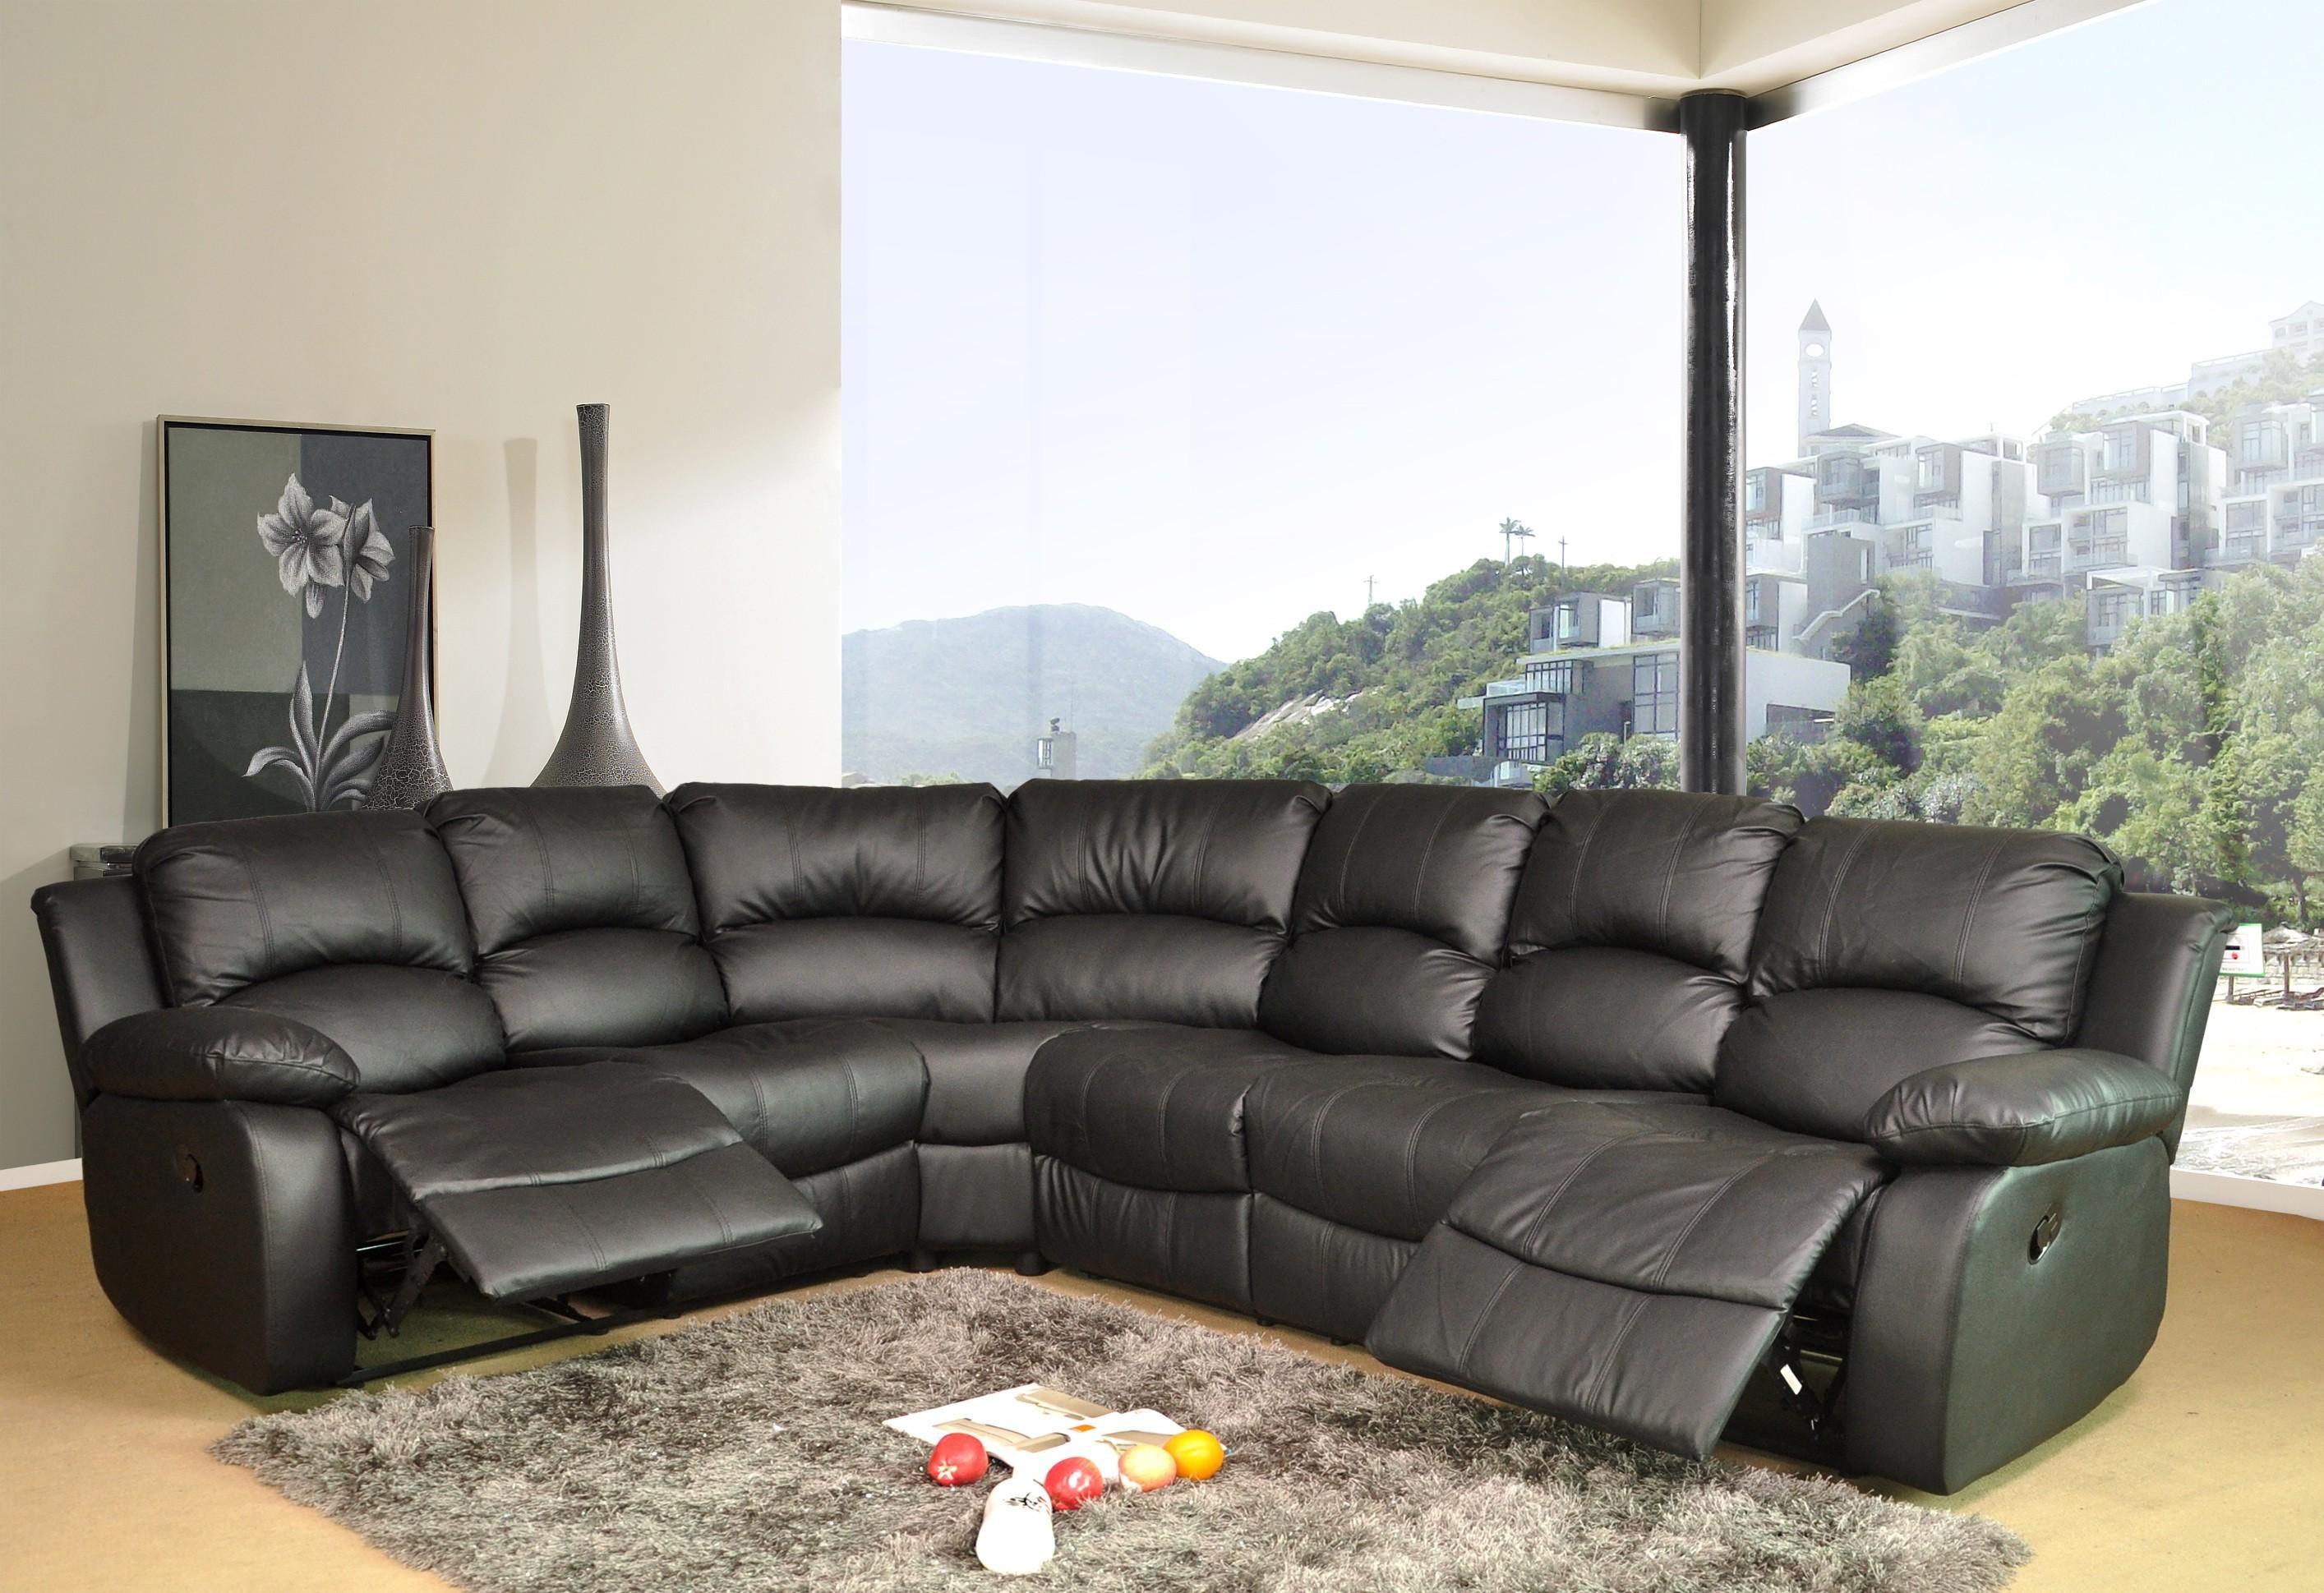 Black Leather Corner Sofa | Sofa Gallery | Kengire Inside Black Corner Sofas (Image 6 of 20)